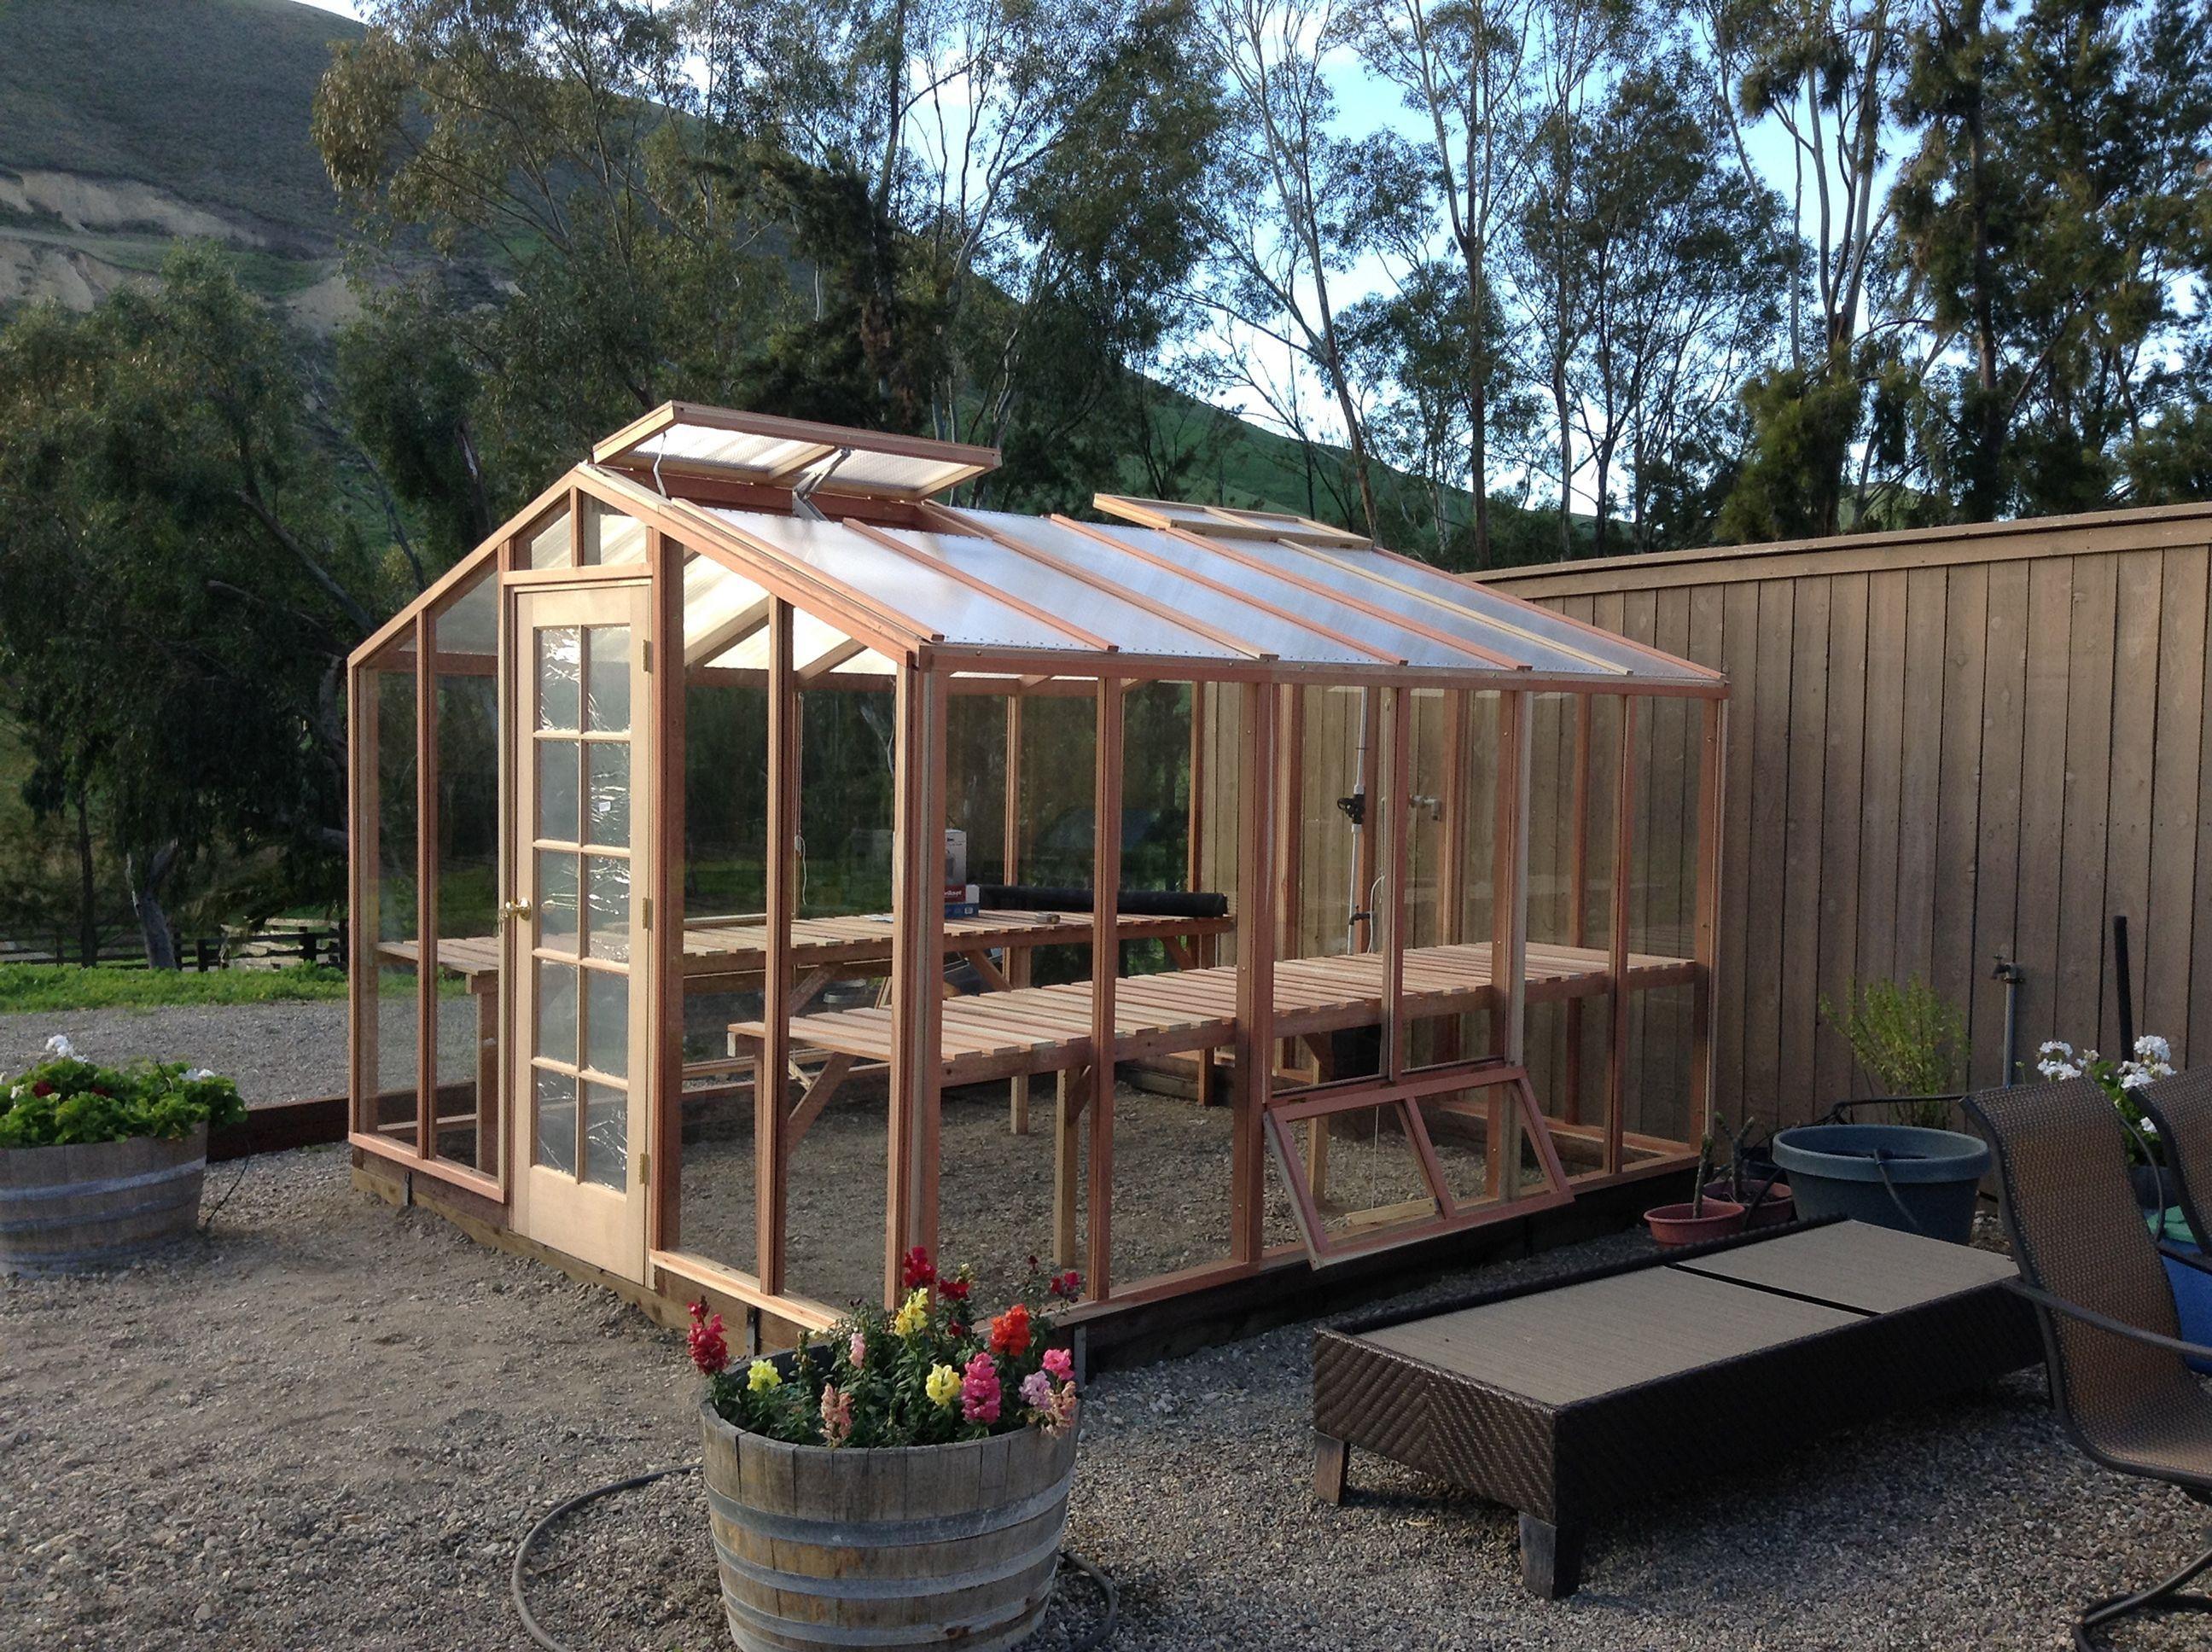 Best Wooden Greenhouse Design Ideas For Home Backyard